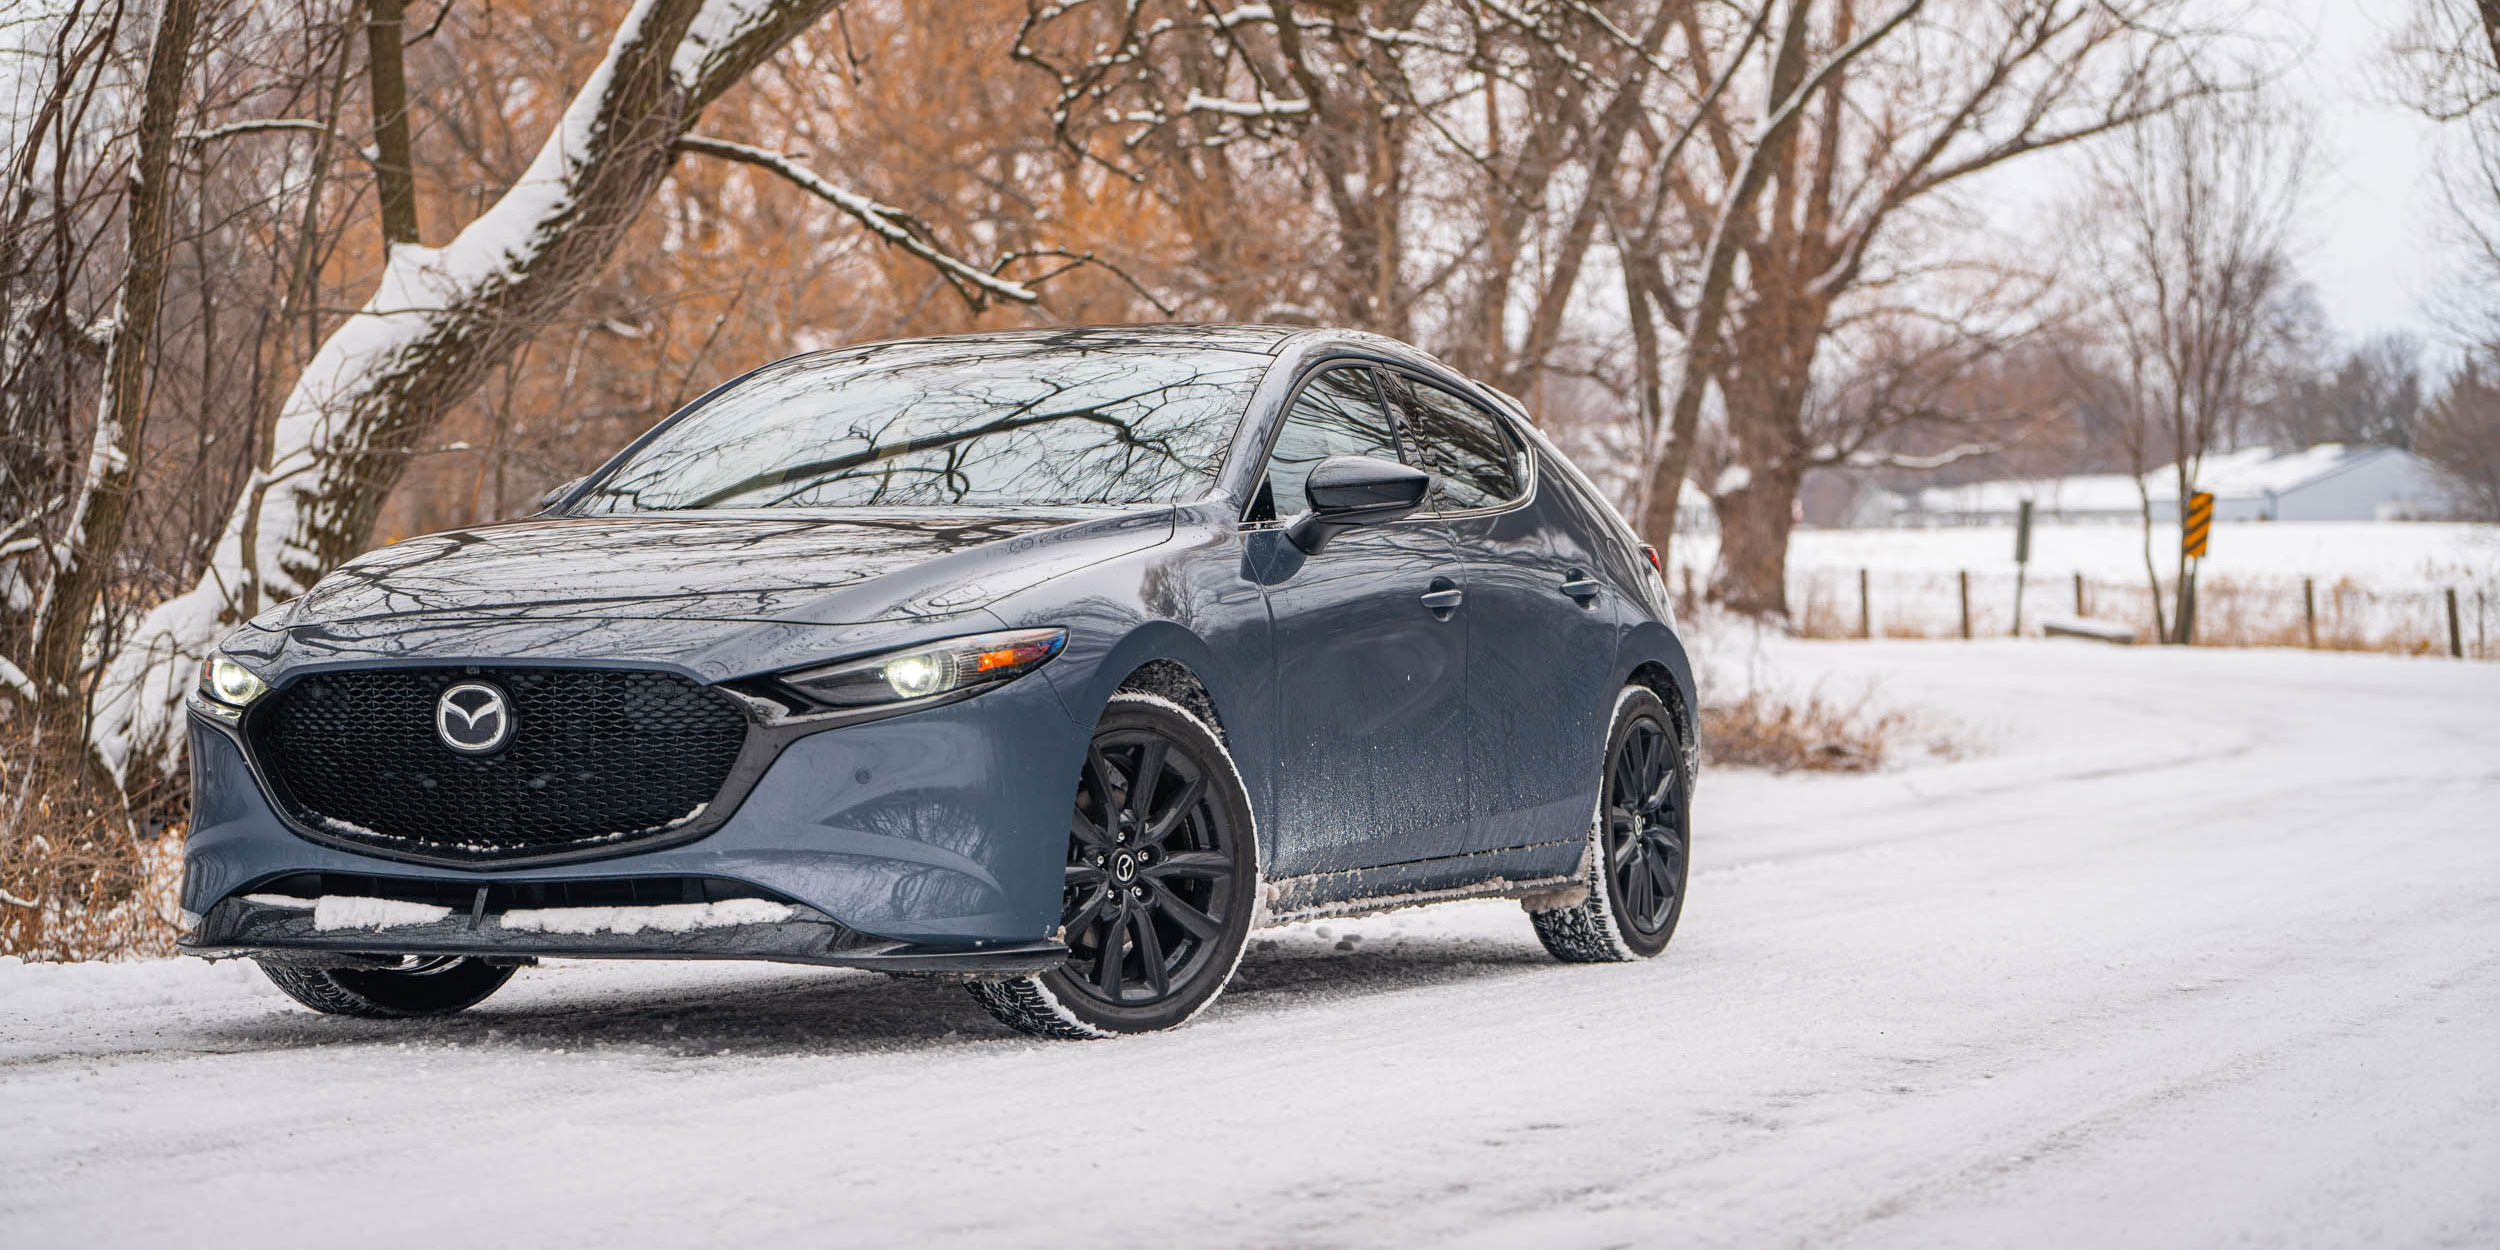 2021 Mazda3 2.5 Turbo AWD